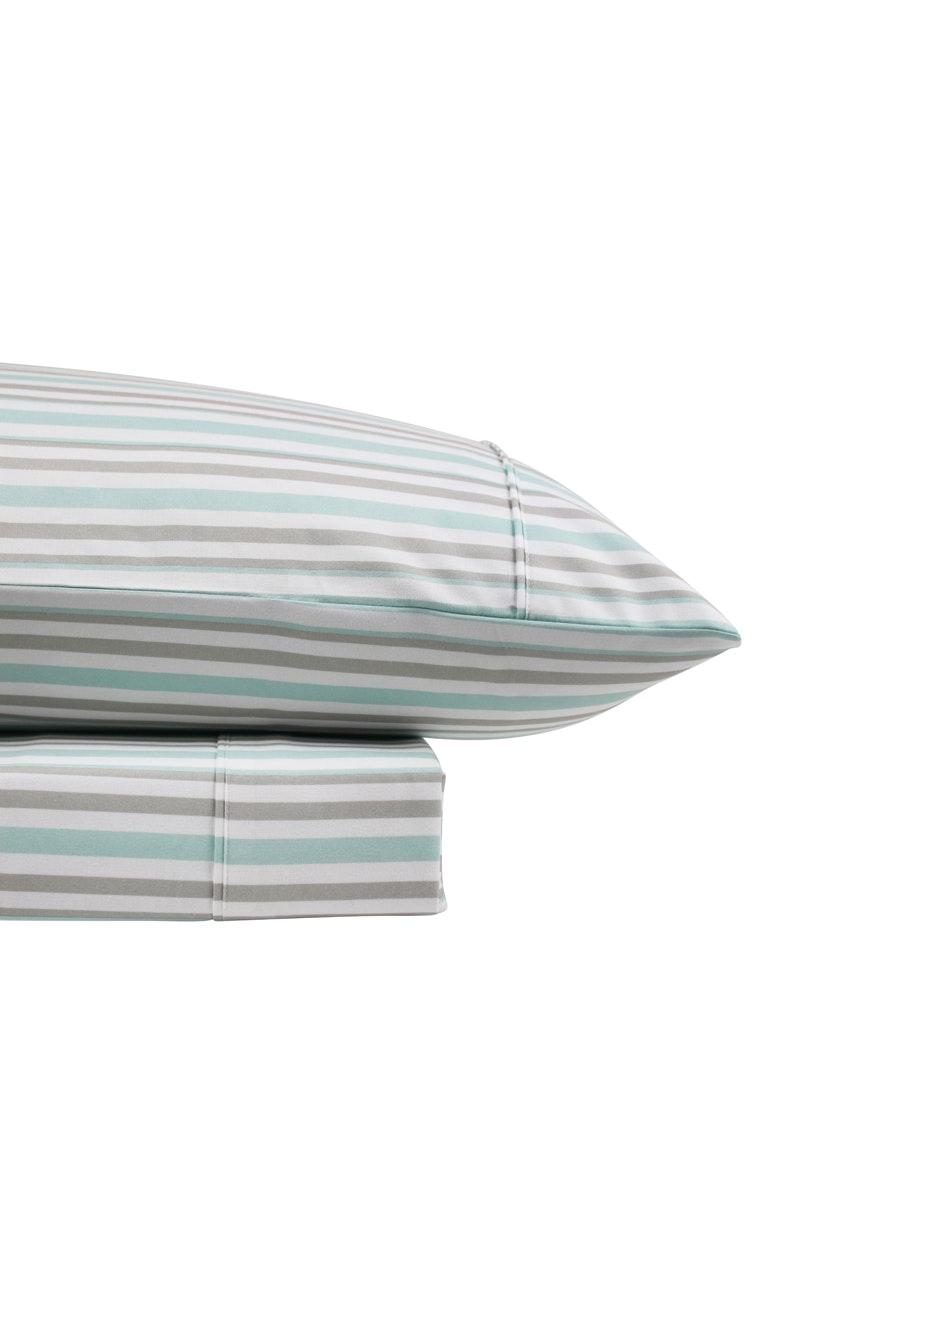 Thermal Flannel Sheet Sets - Stripe Design - Ice/Glacier - Double Bed